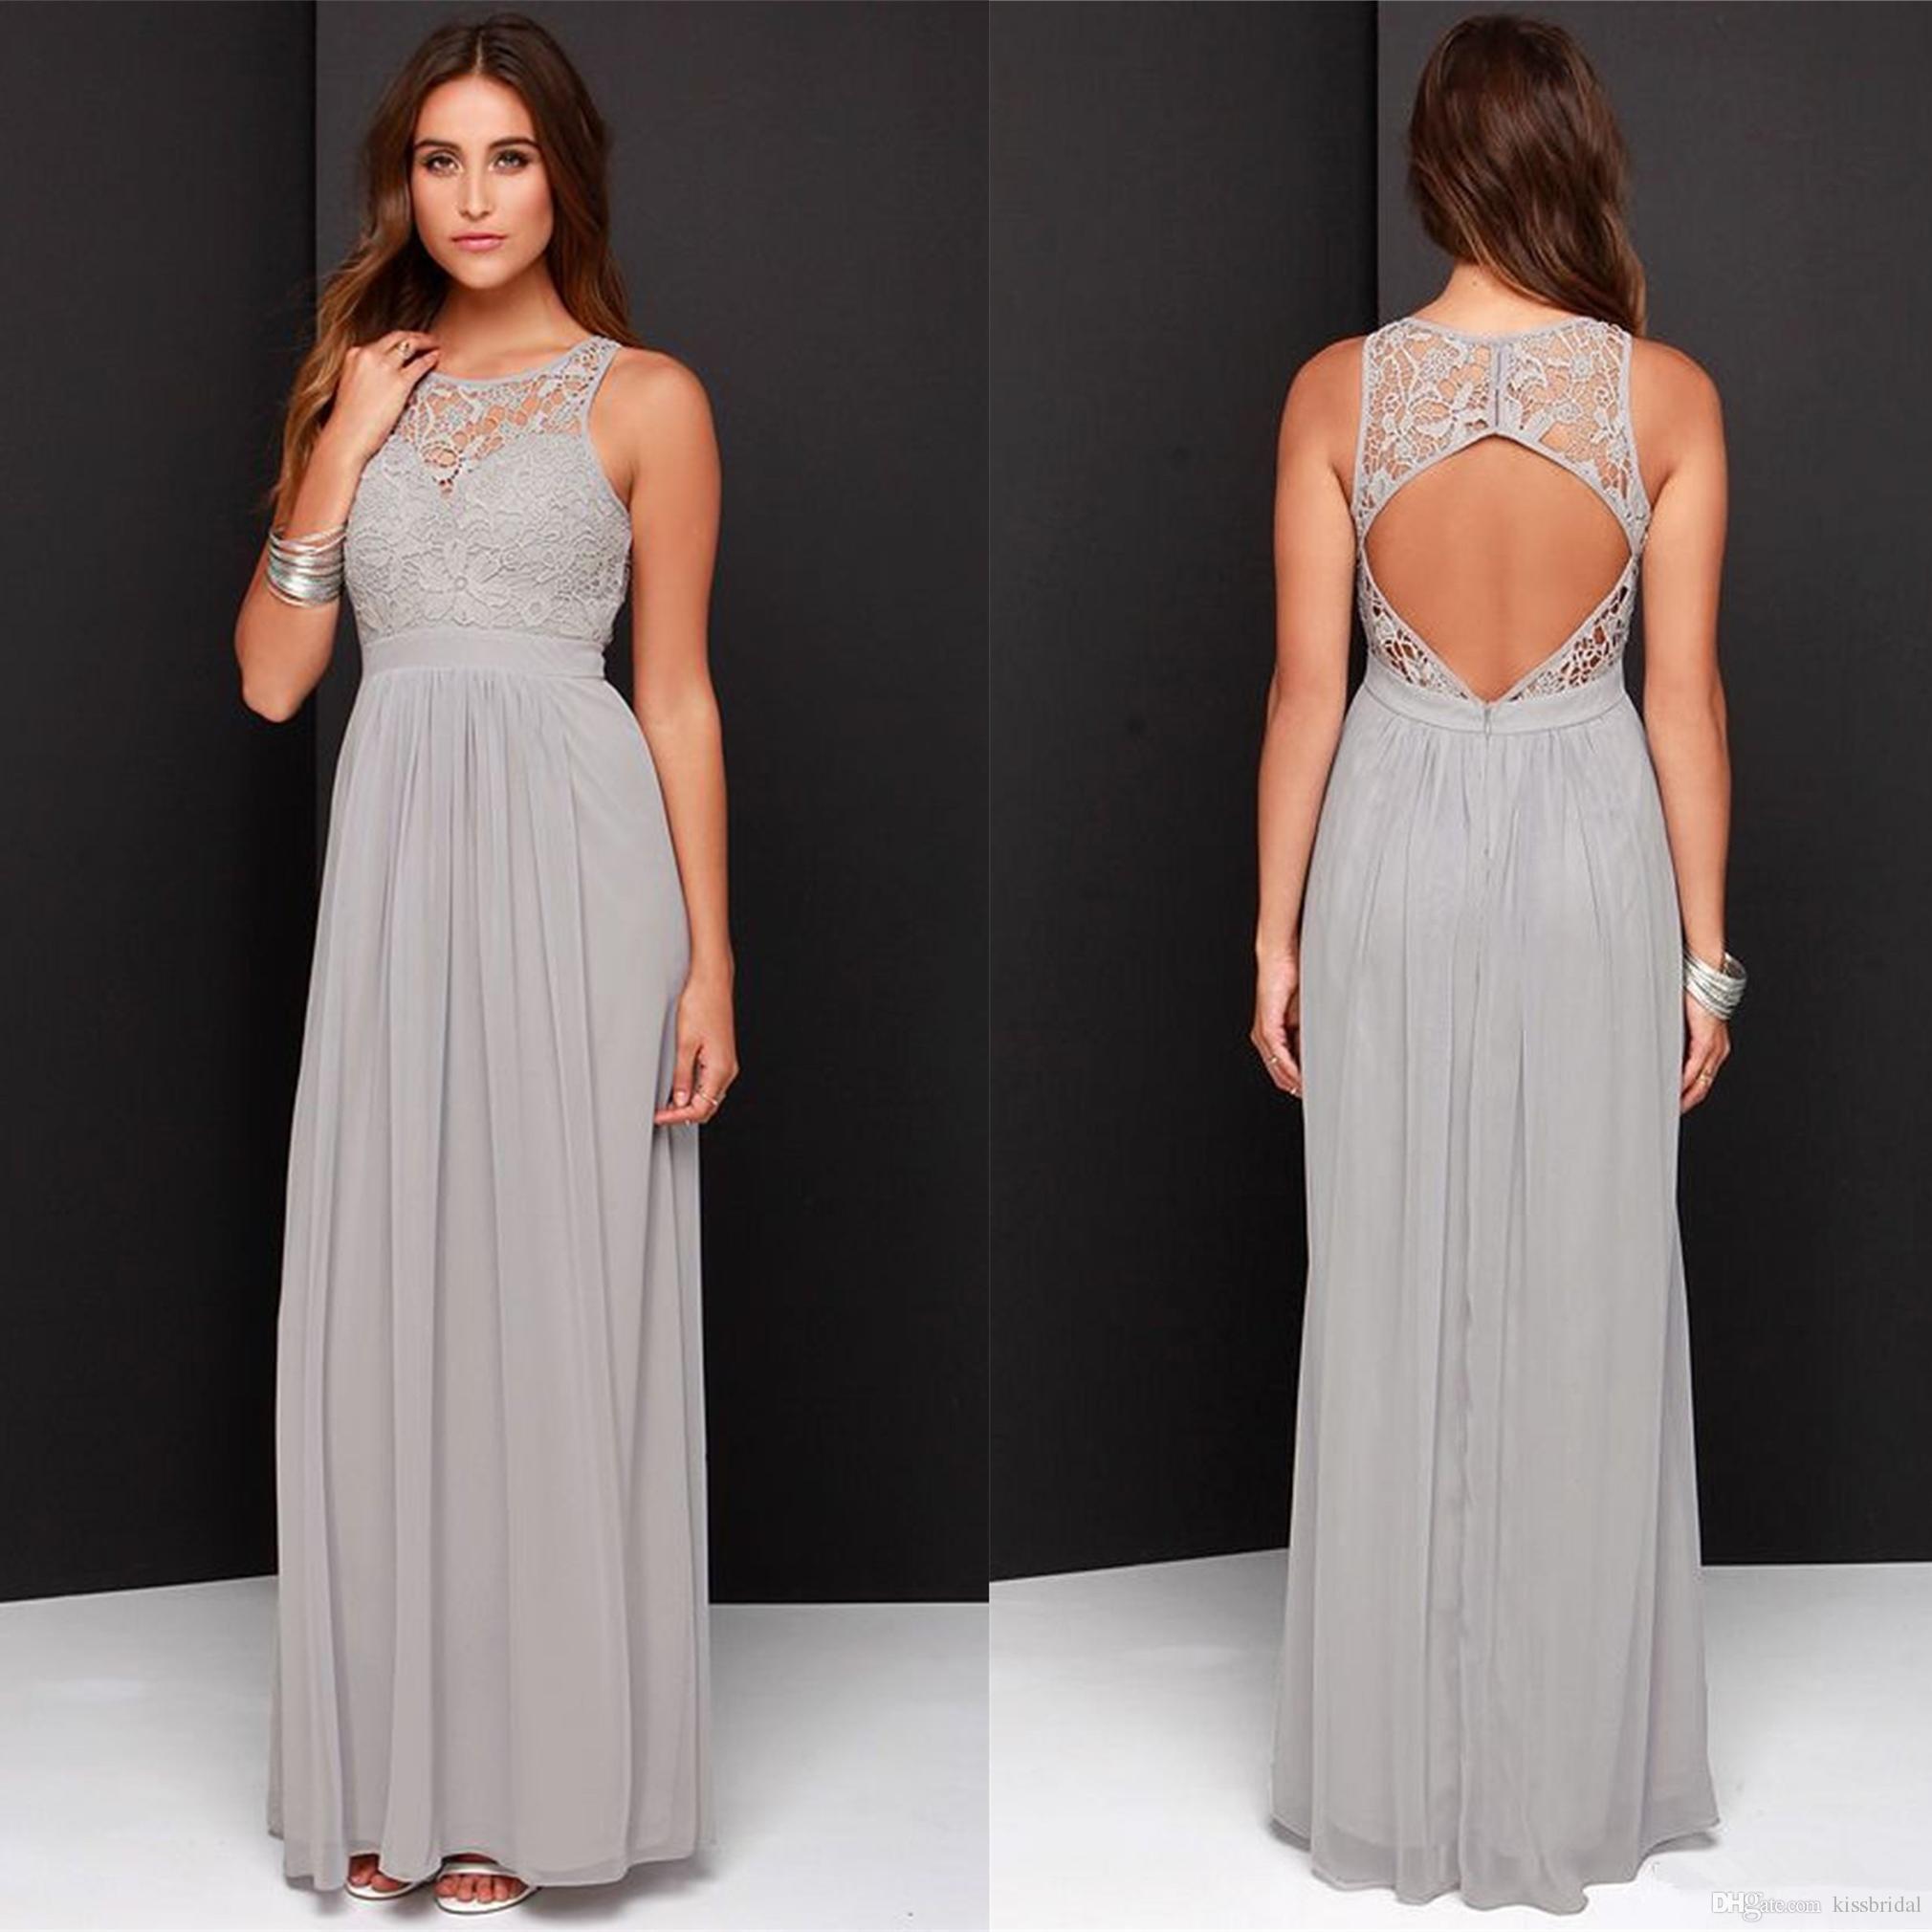 Robe Longue Pour Mariage Invite Buy 052ba 79c7c